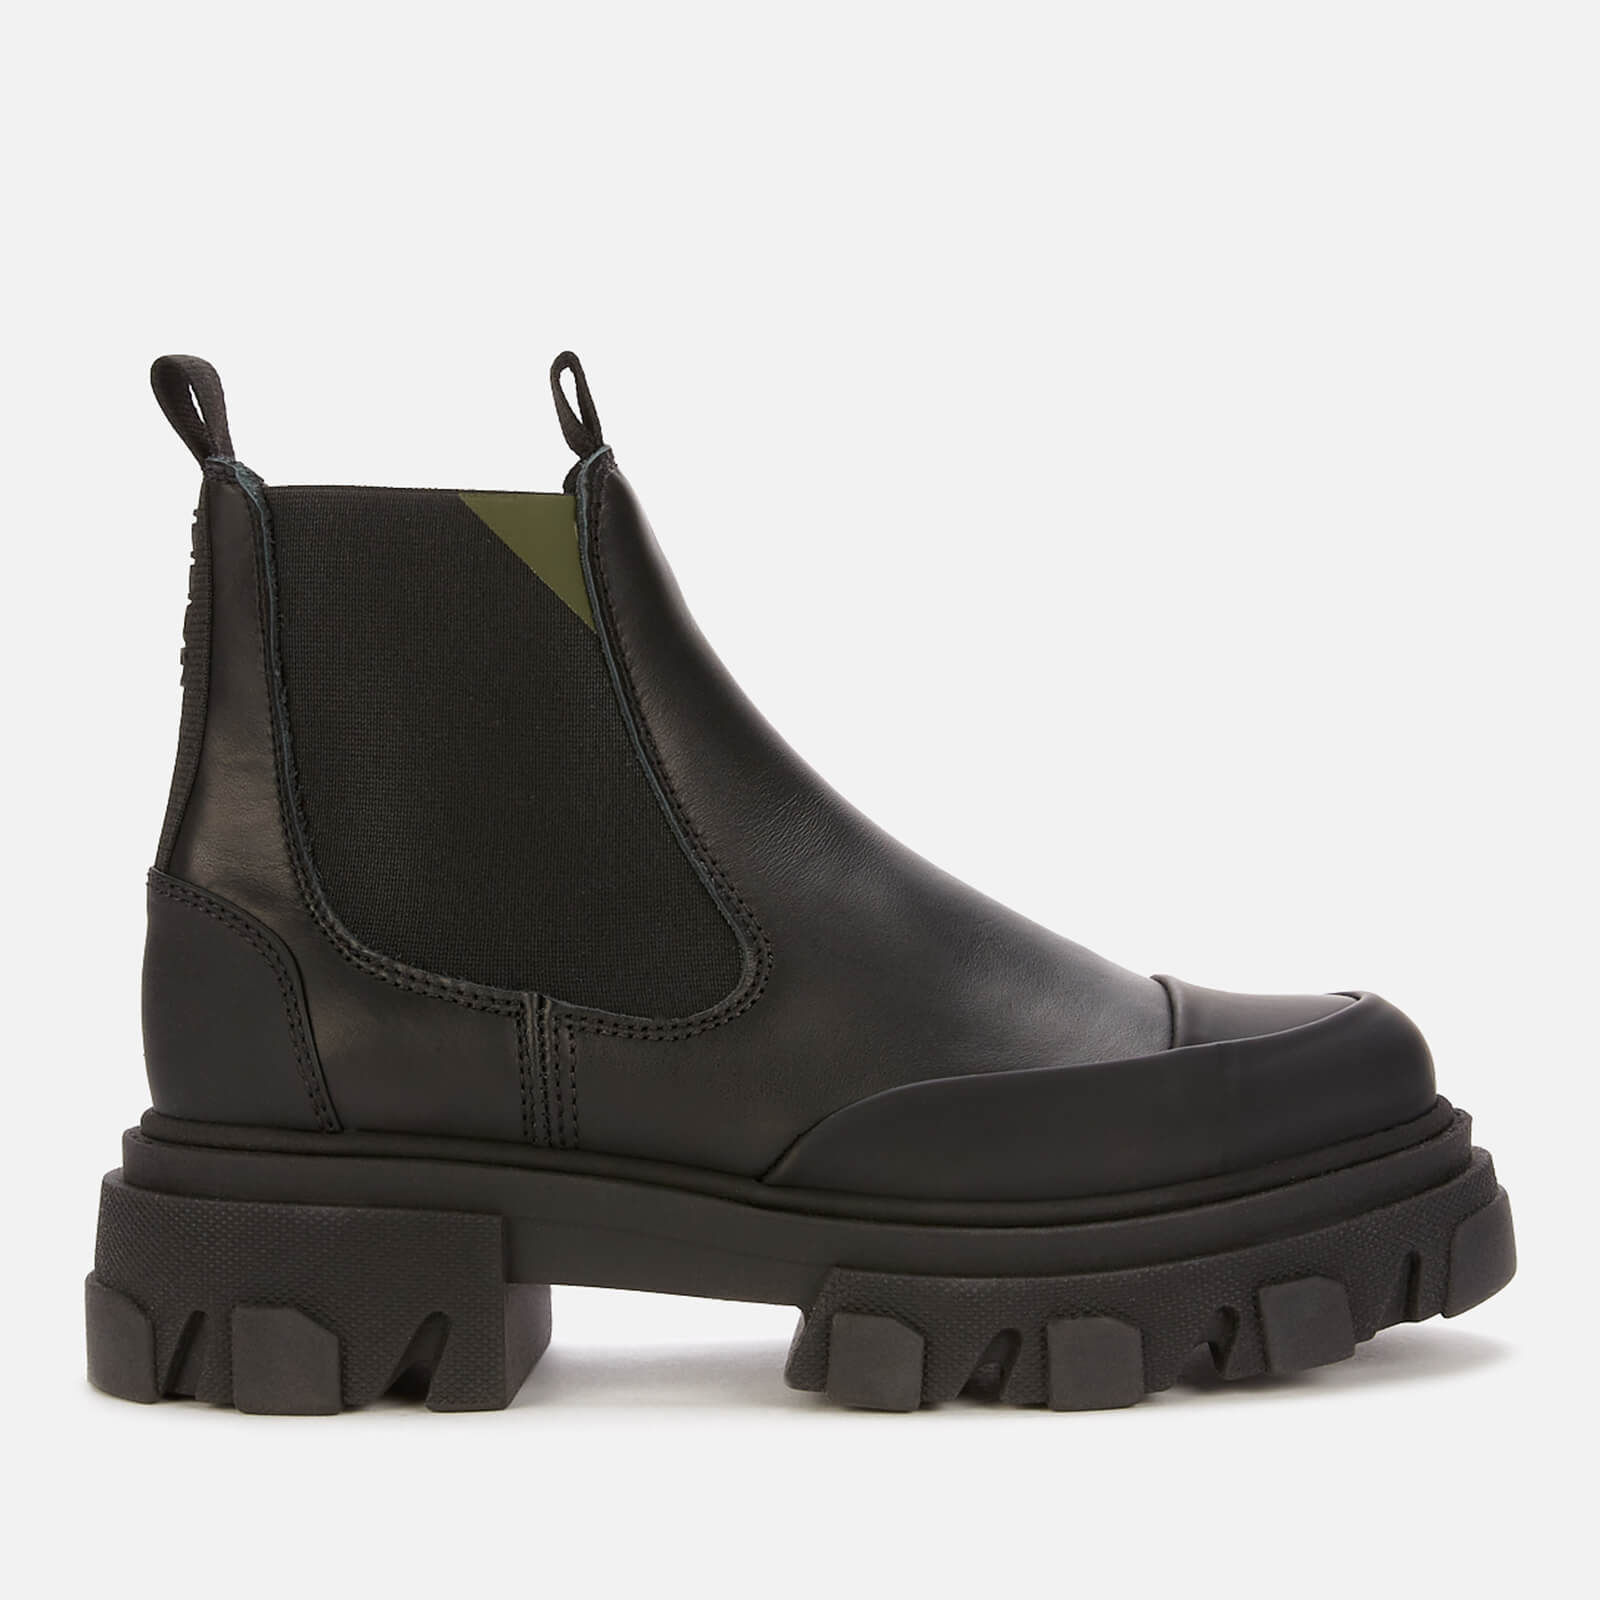 Ganni Women's Leather Chelsea Boots - Black - Uk 6